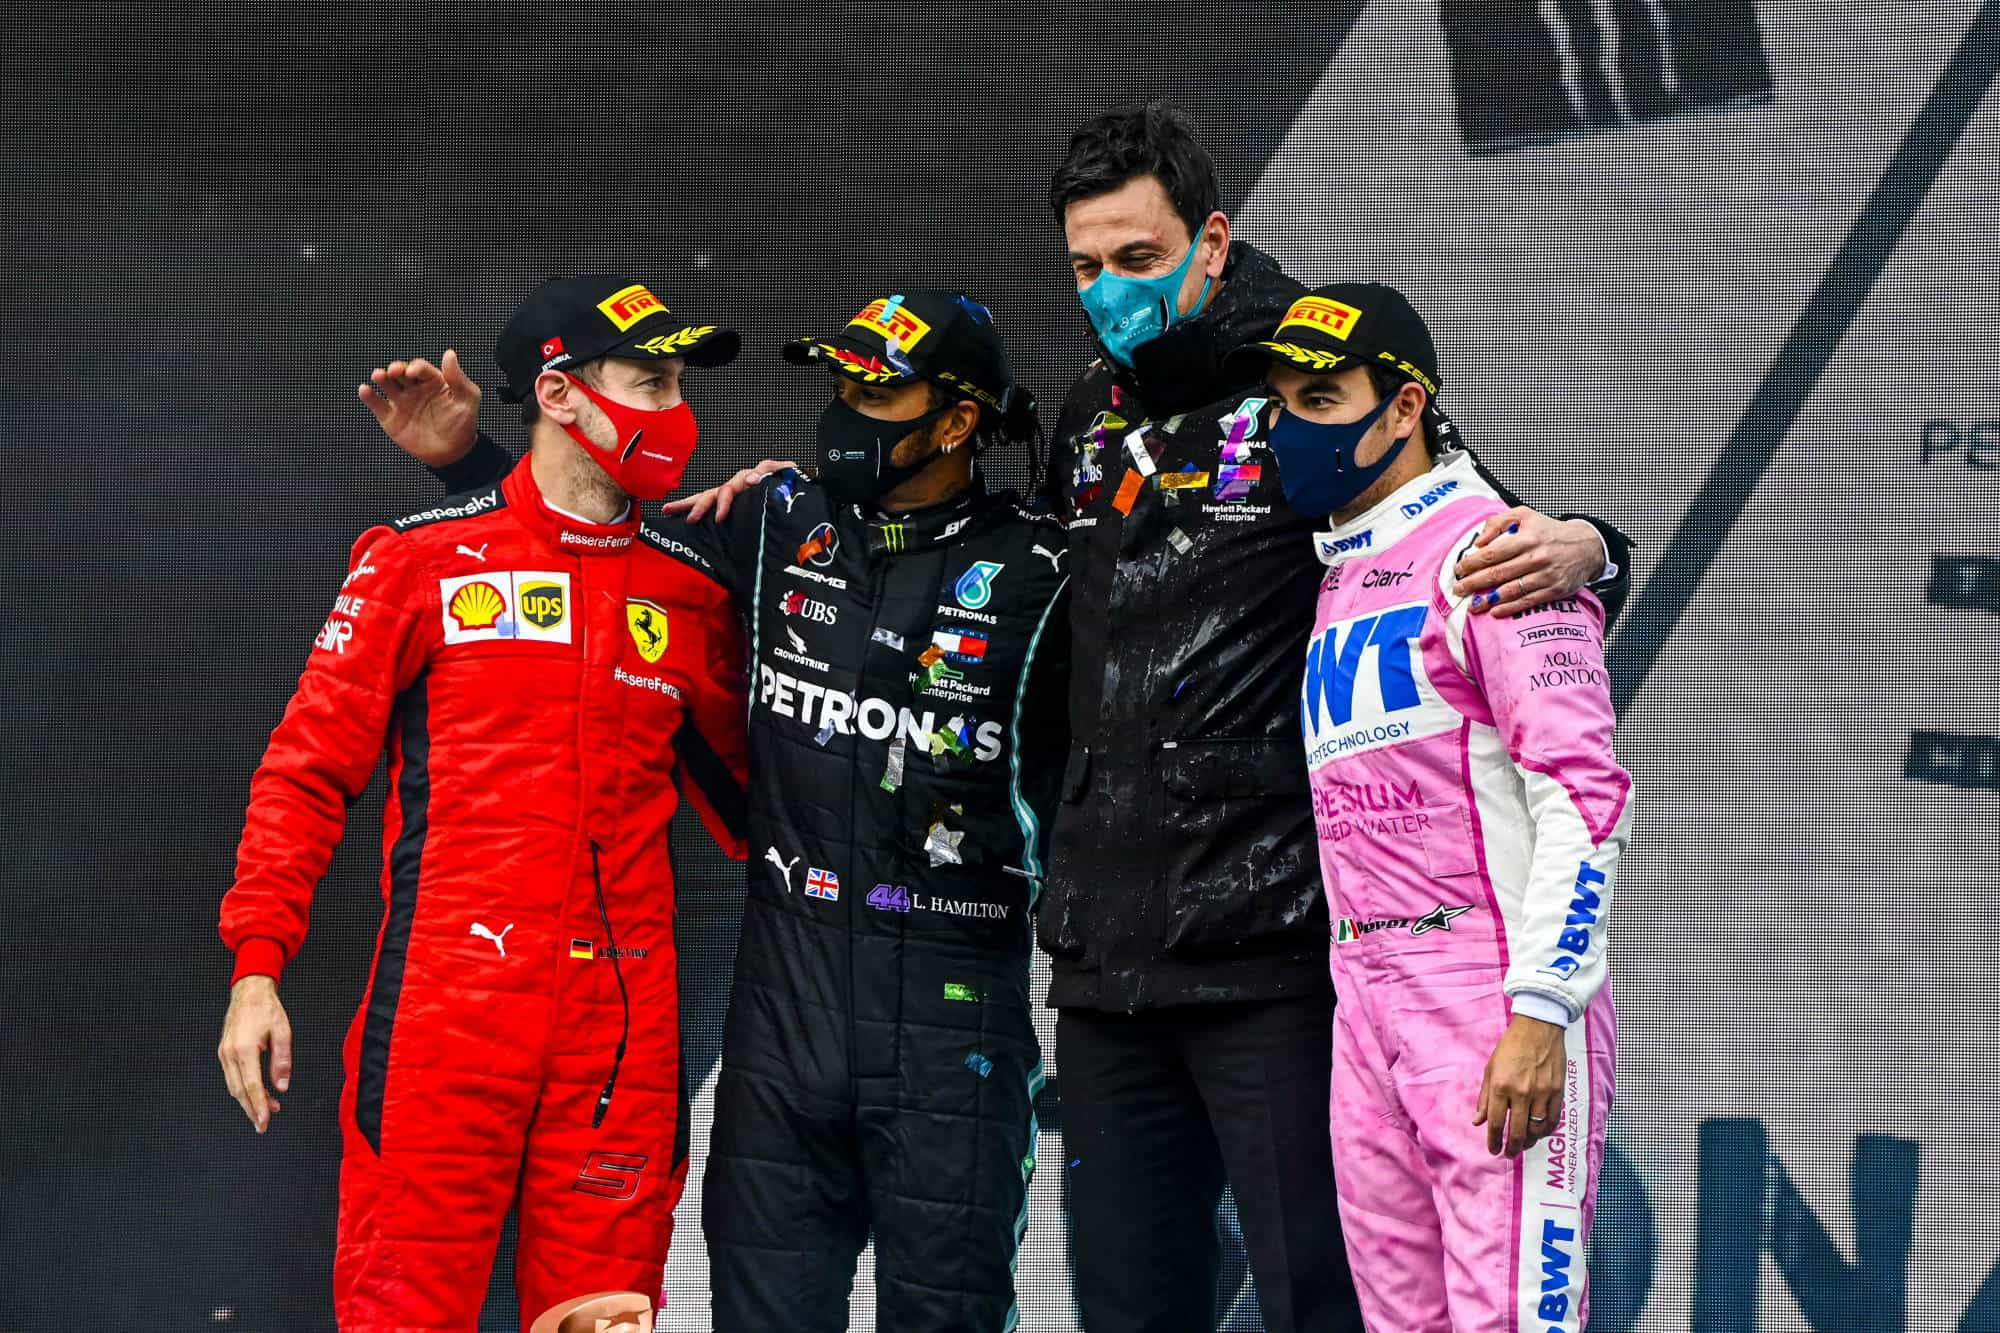 2020 Turkish GP Hamilton Vettel Perez and Wolff on the podium Photo Daimler